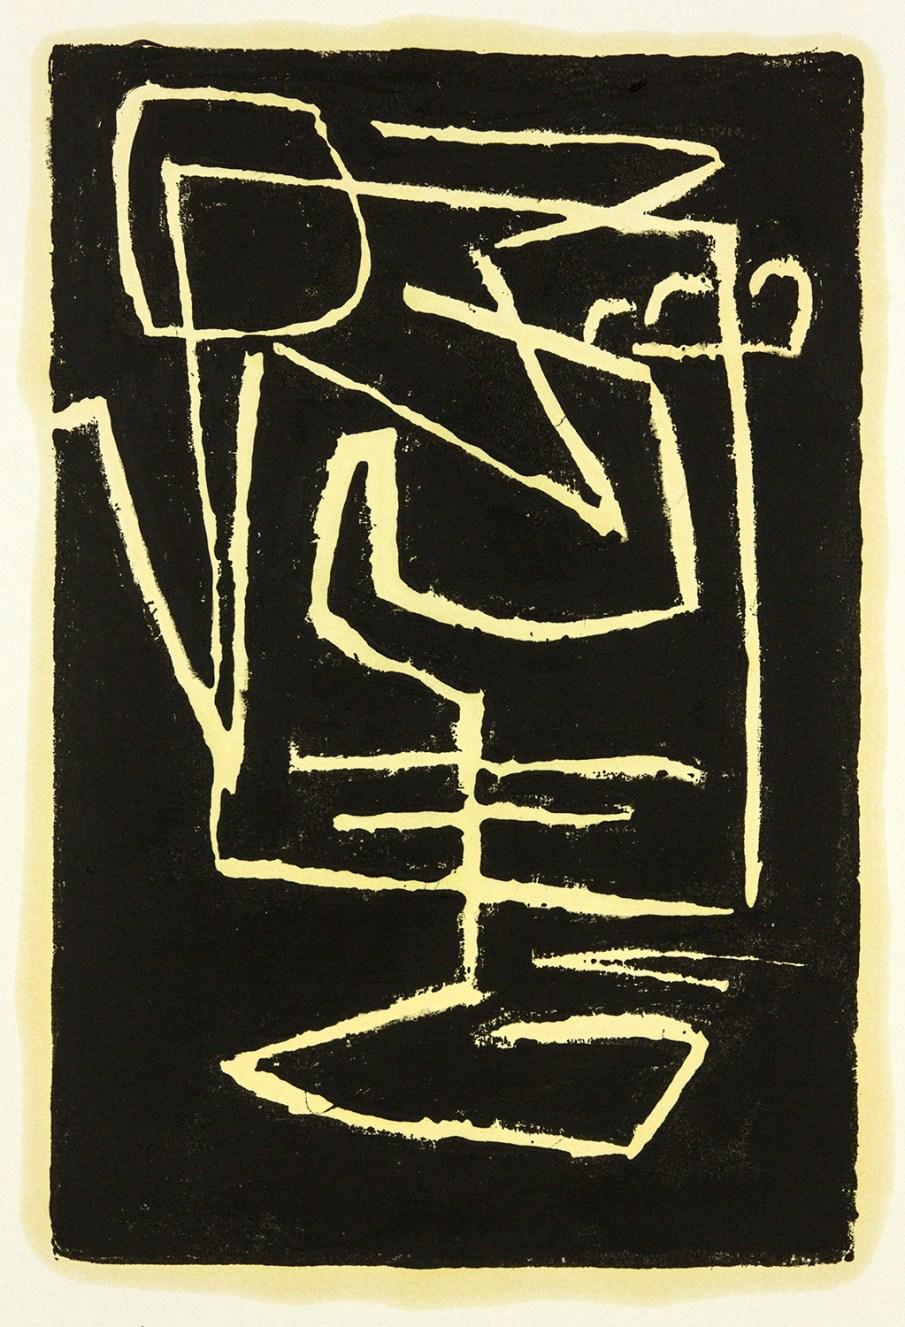 Still Life, monoprint, ink on paper, 17 X 14, 2020